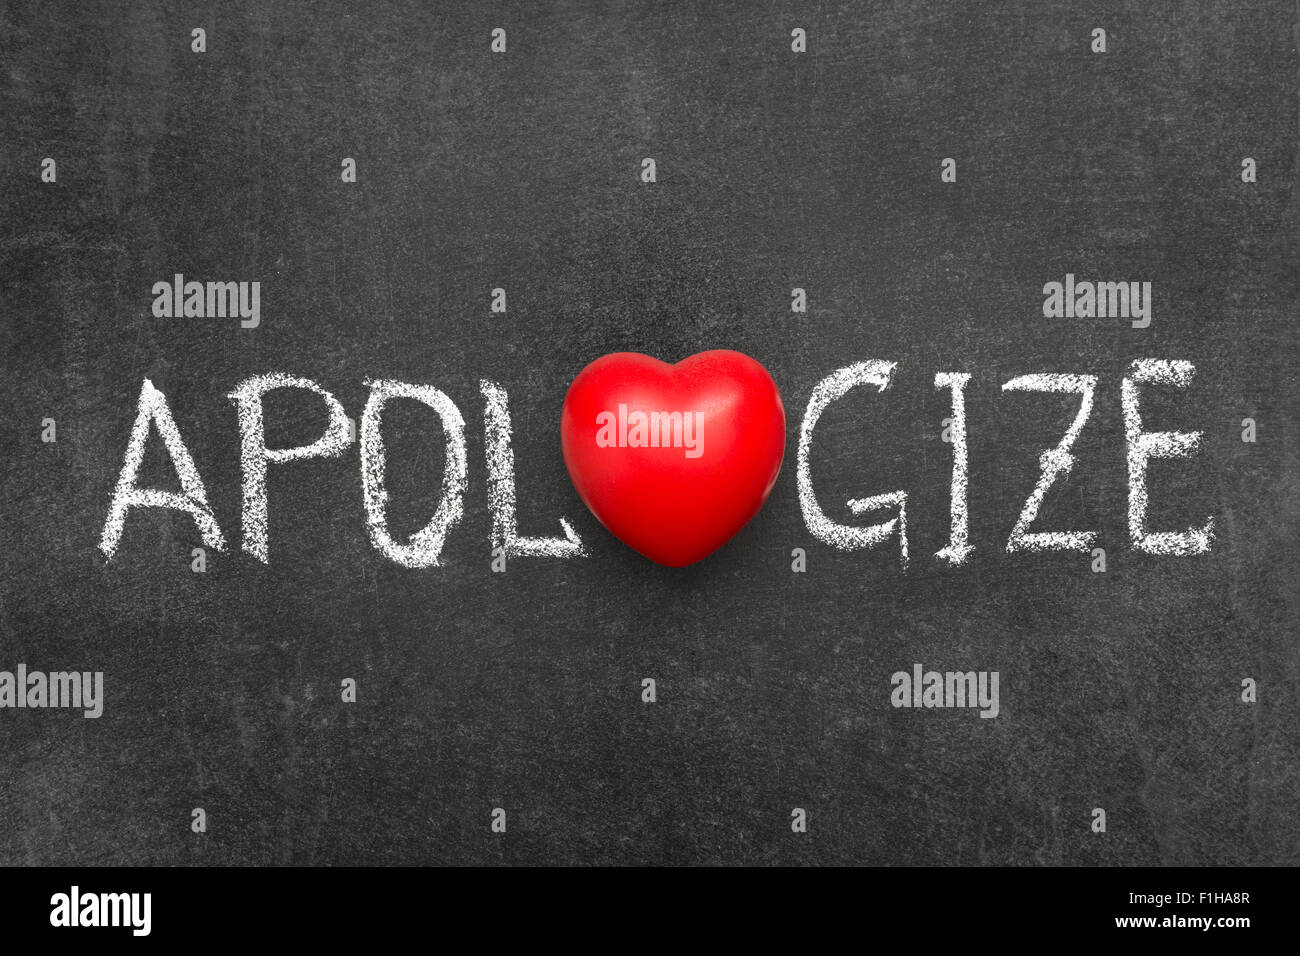 Apologize word handwritten on blackboard with heart symbol instead apologize word handwritten on blackboard with heart symbol instead of o biocorpaavc